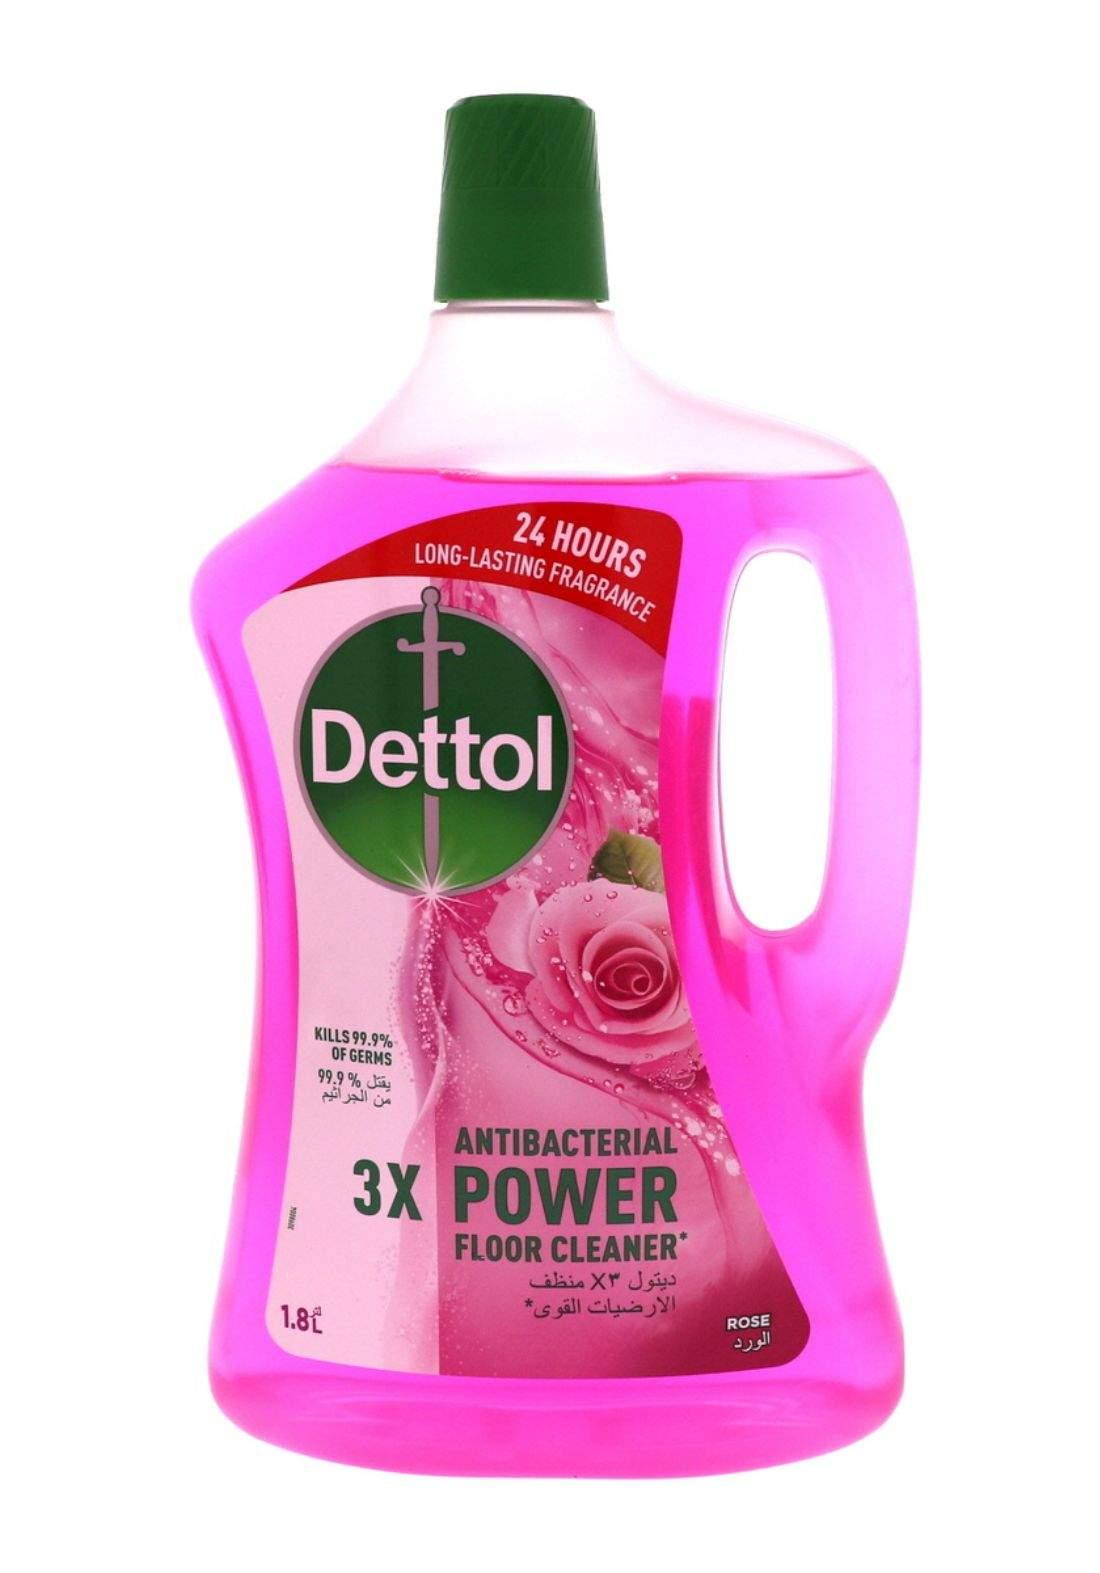 Dettol floor cleaner  1.8 ديتول منظف ارضيات القوي مل